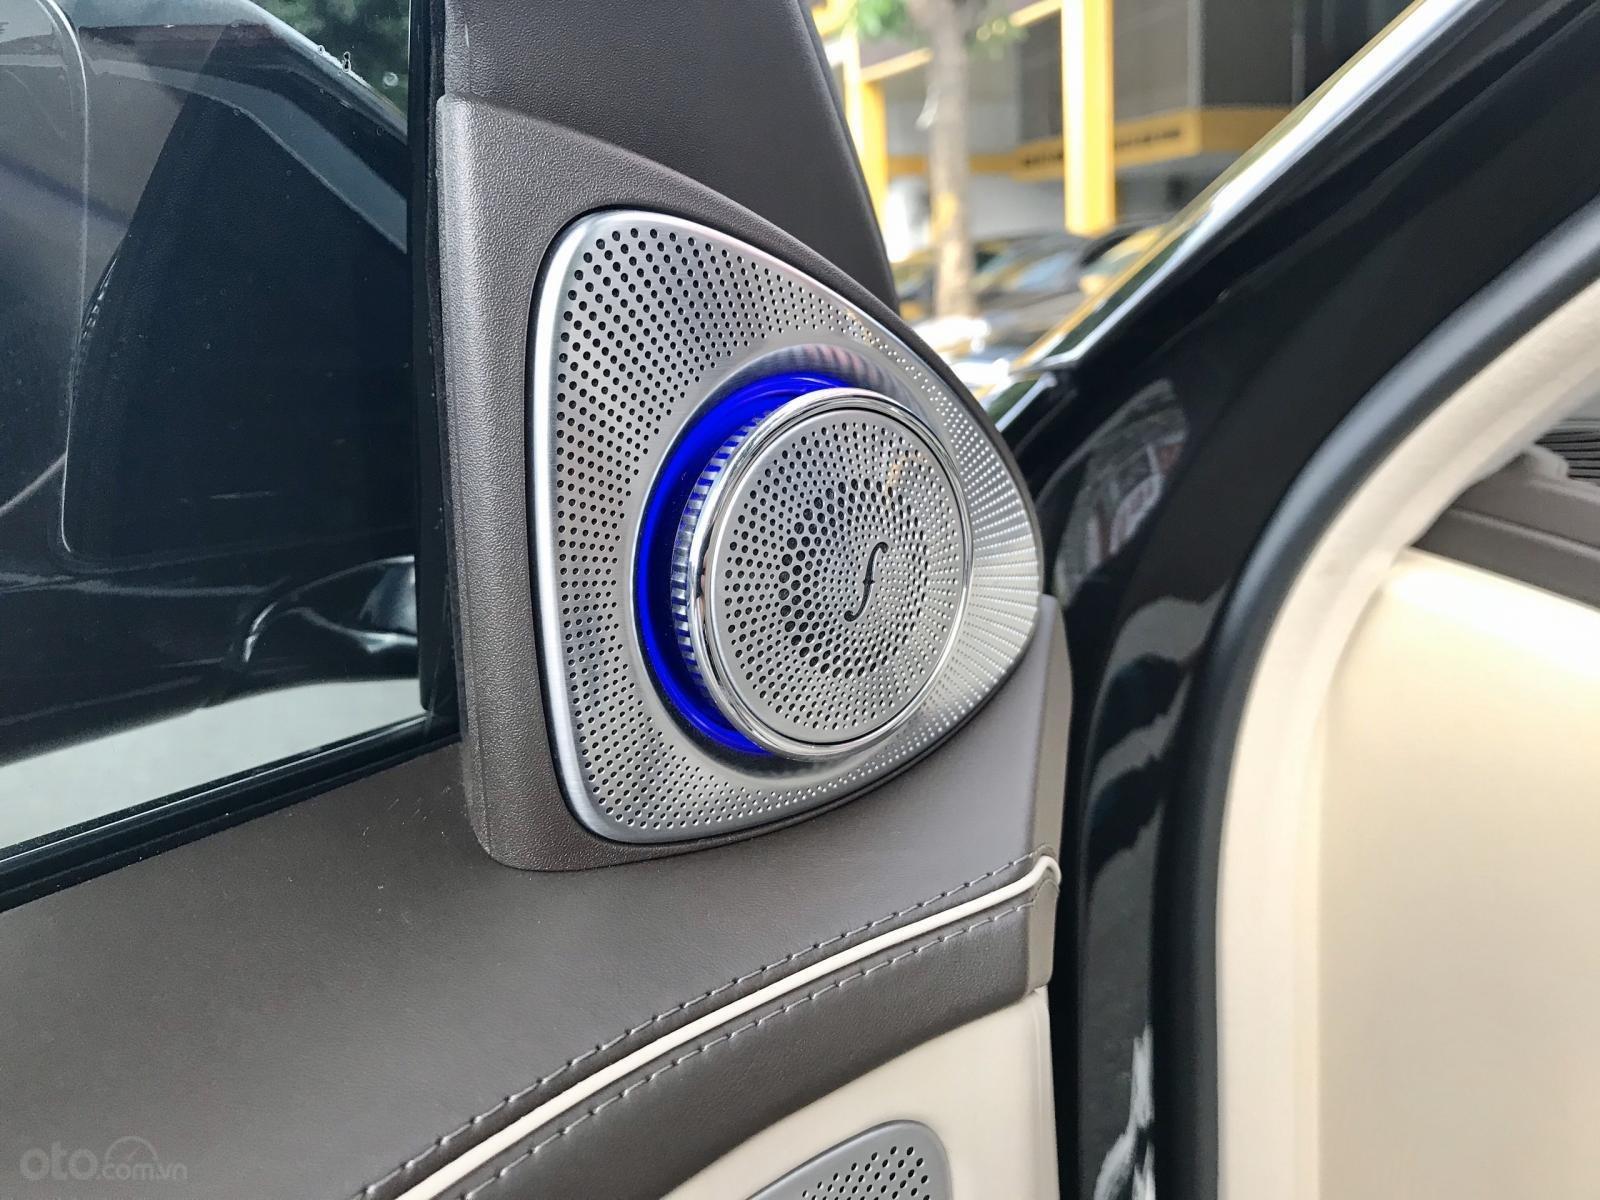 Mercedes Benz S450 Luxury sản xuất 2019 (15)